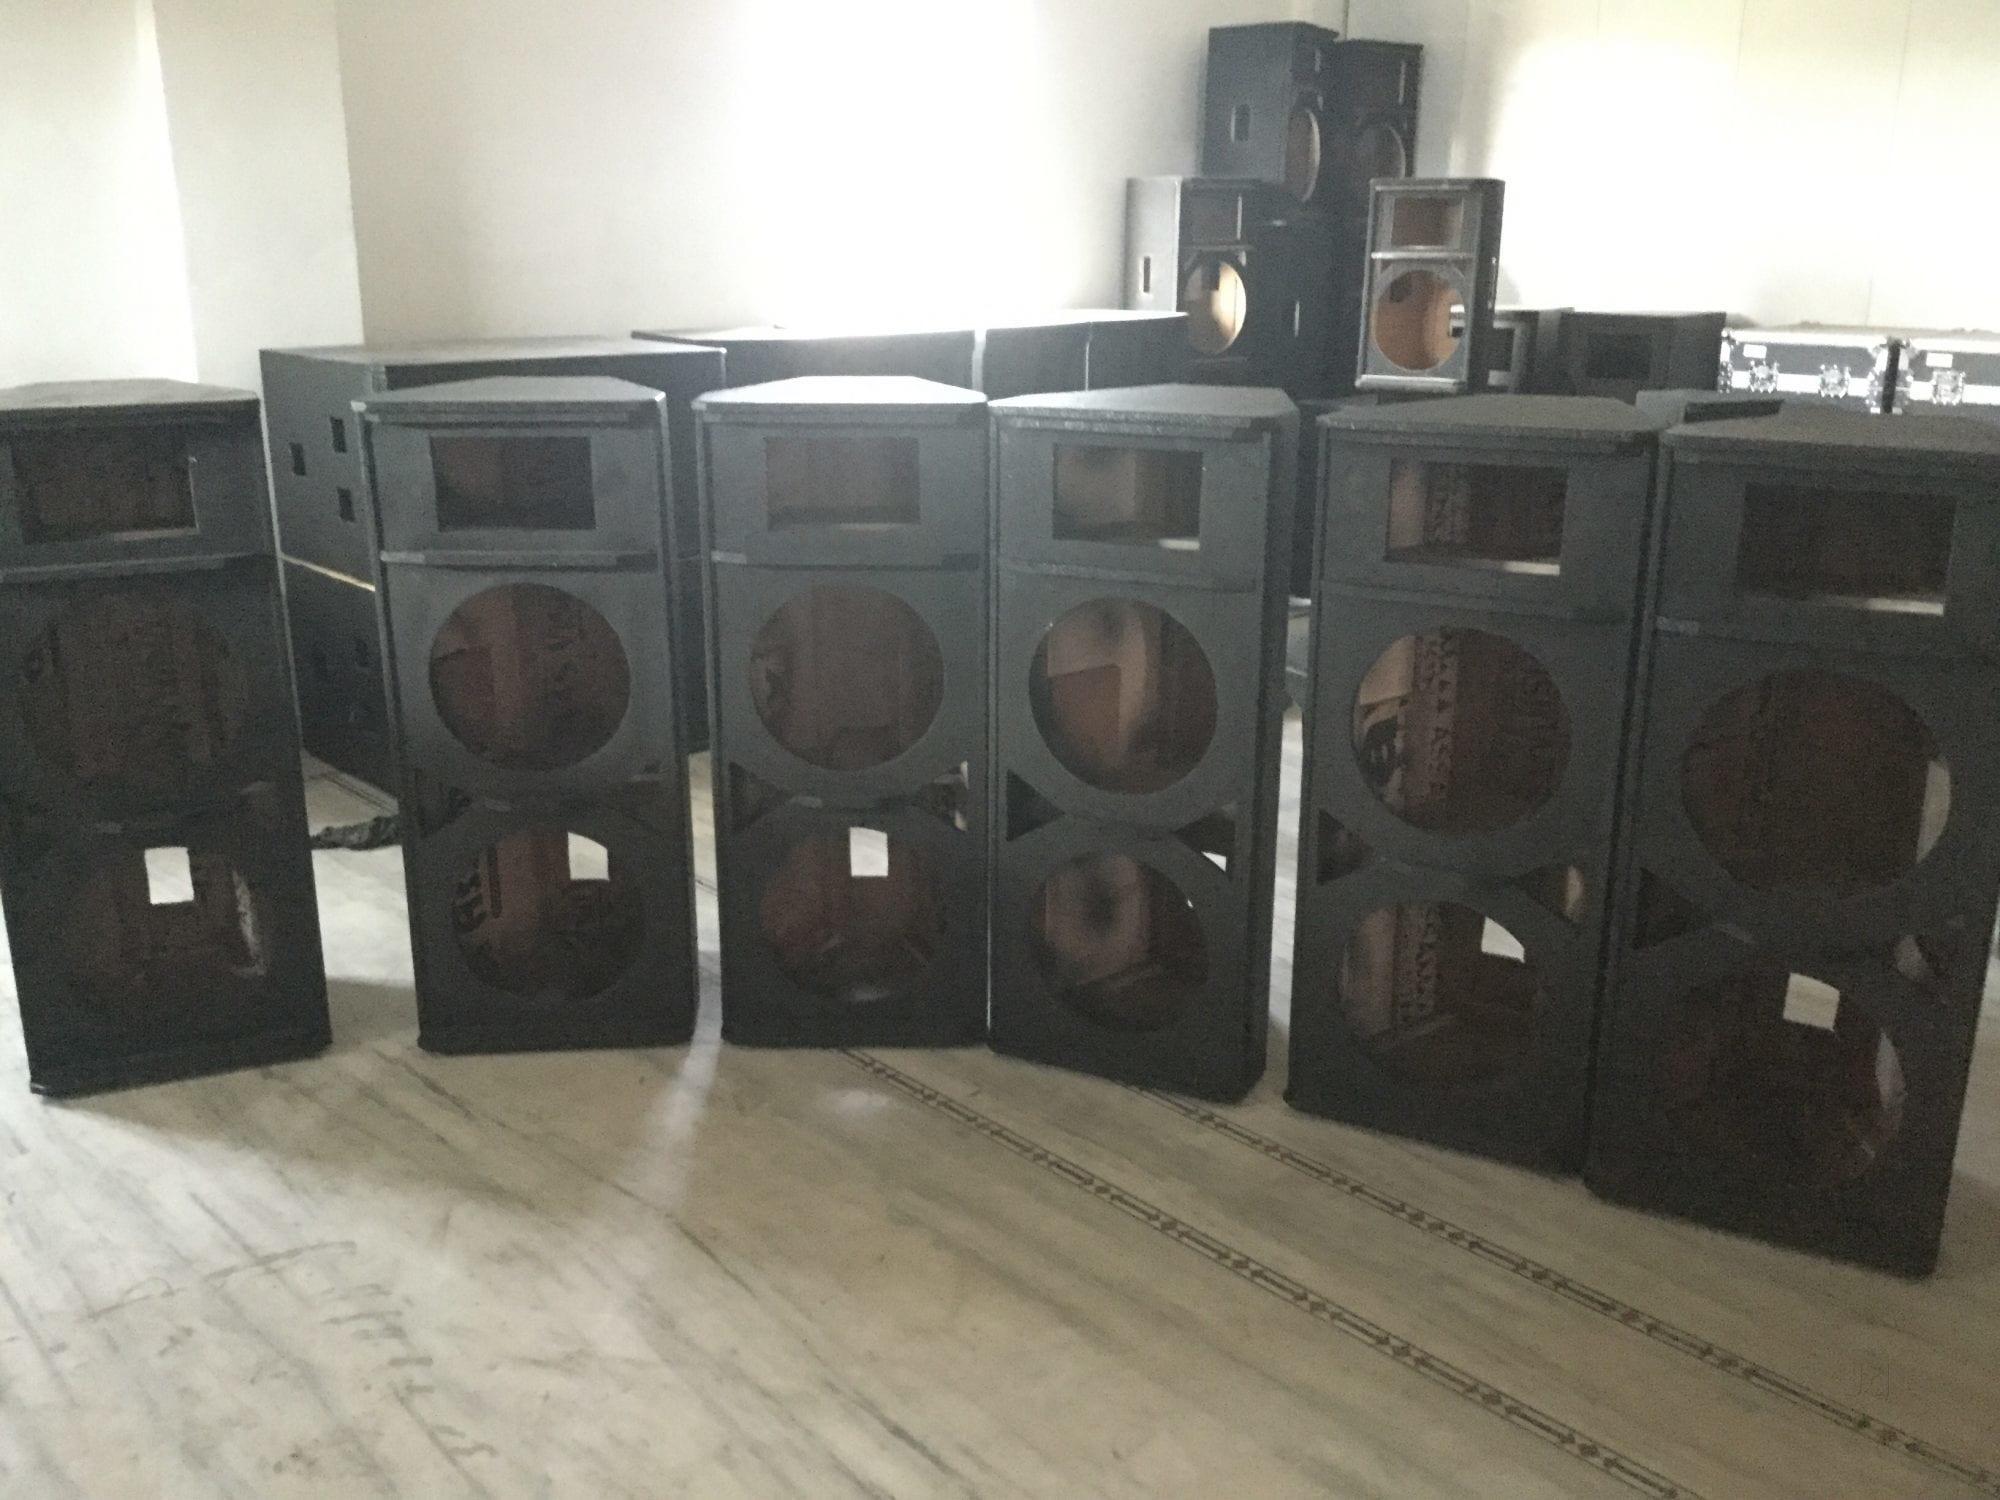 Top Speaker Box Manufacturers in Jaipur - Justdial